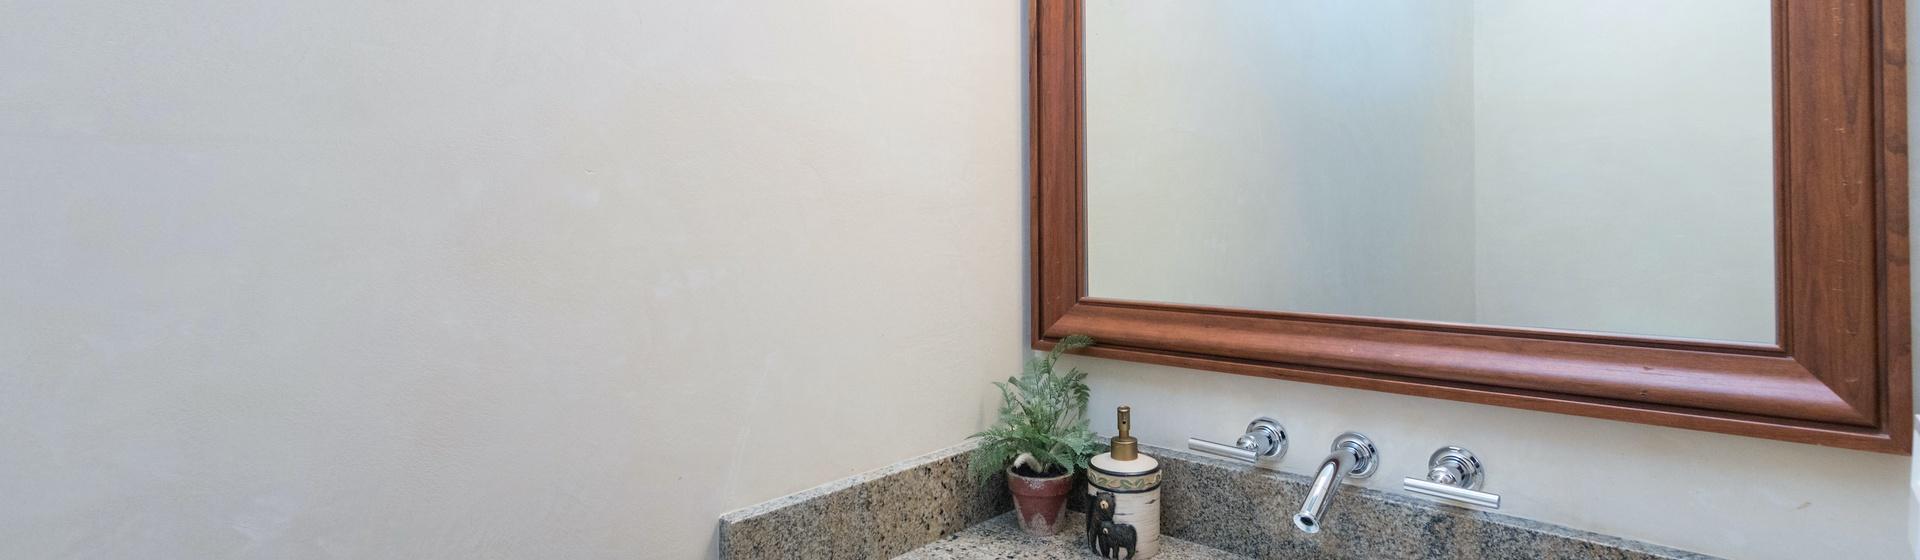 5.10-mountain-village-hood-park-manor-master-bedroom-b-bathroom-powder-room-track.JPG